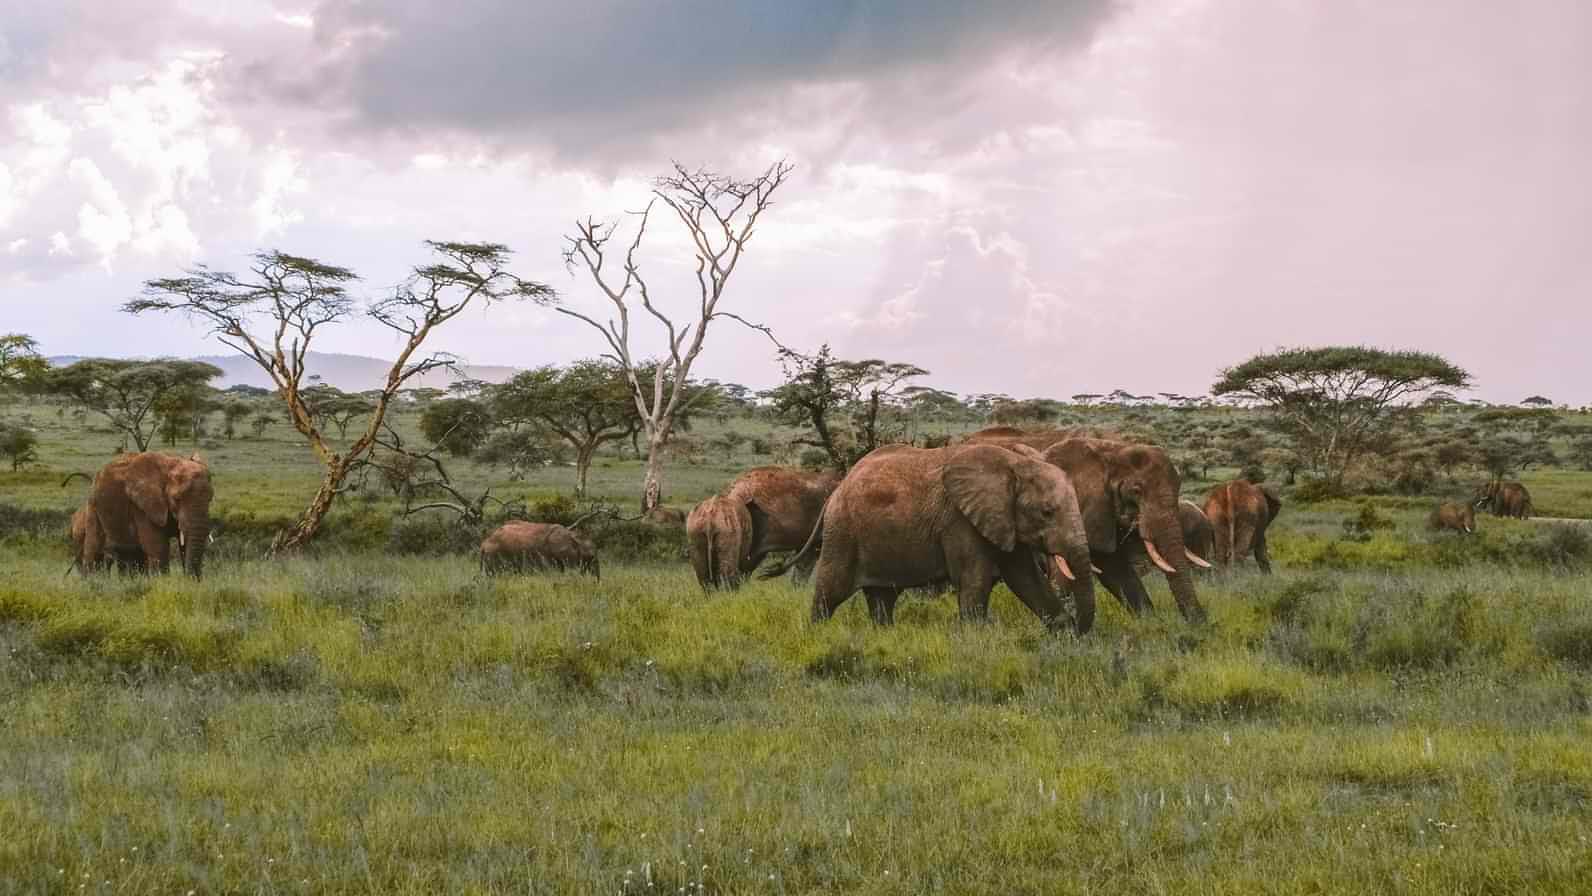 A heard of elephants in the evening light of the Serengeti National Park, Tanzania